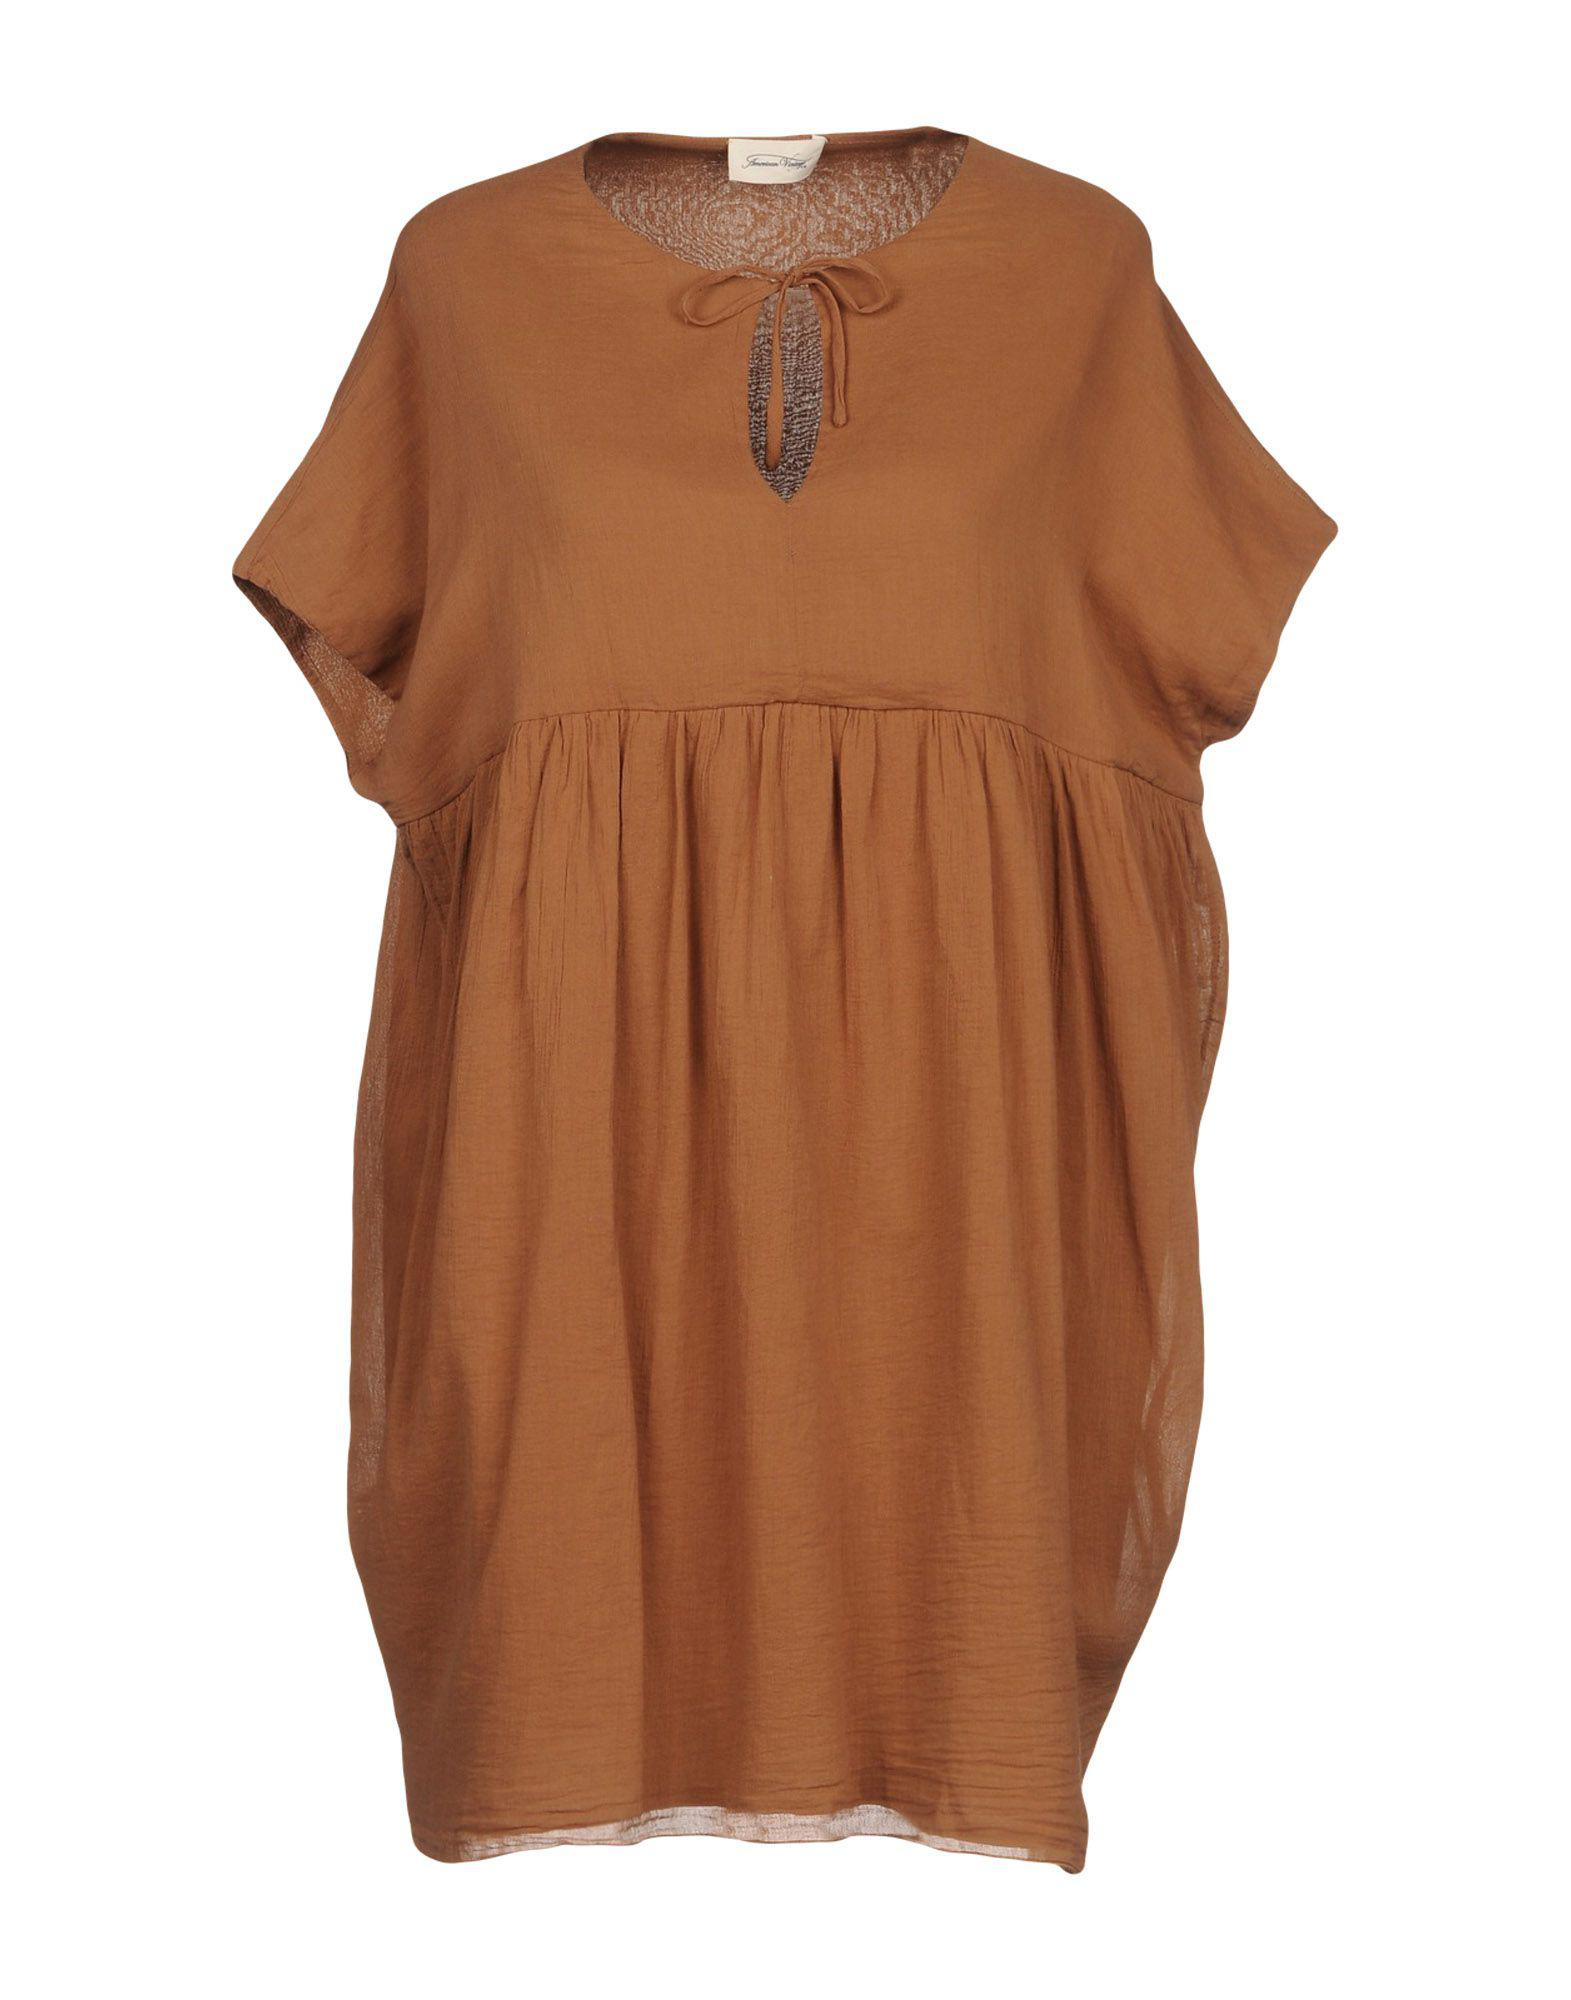 DRESSES - Short dresses American Vintage mbKhbS3jV